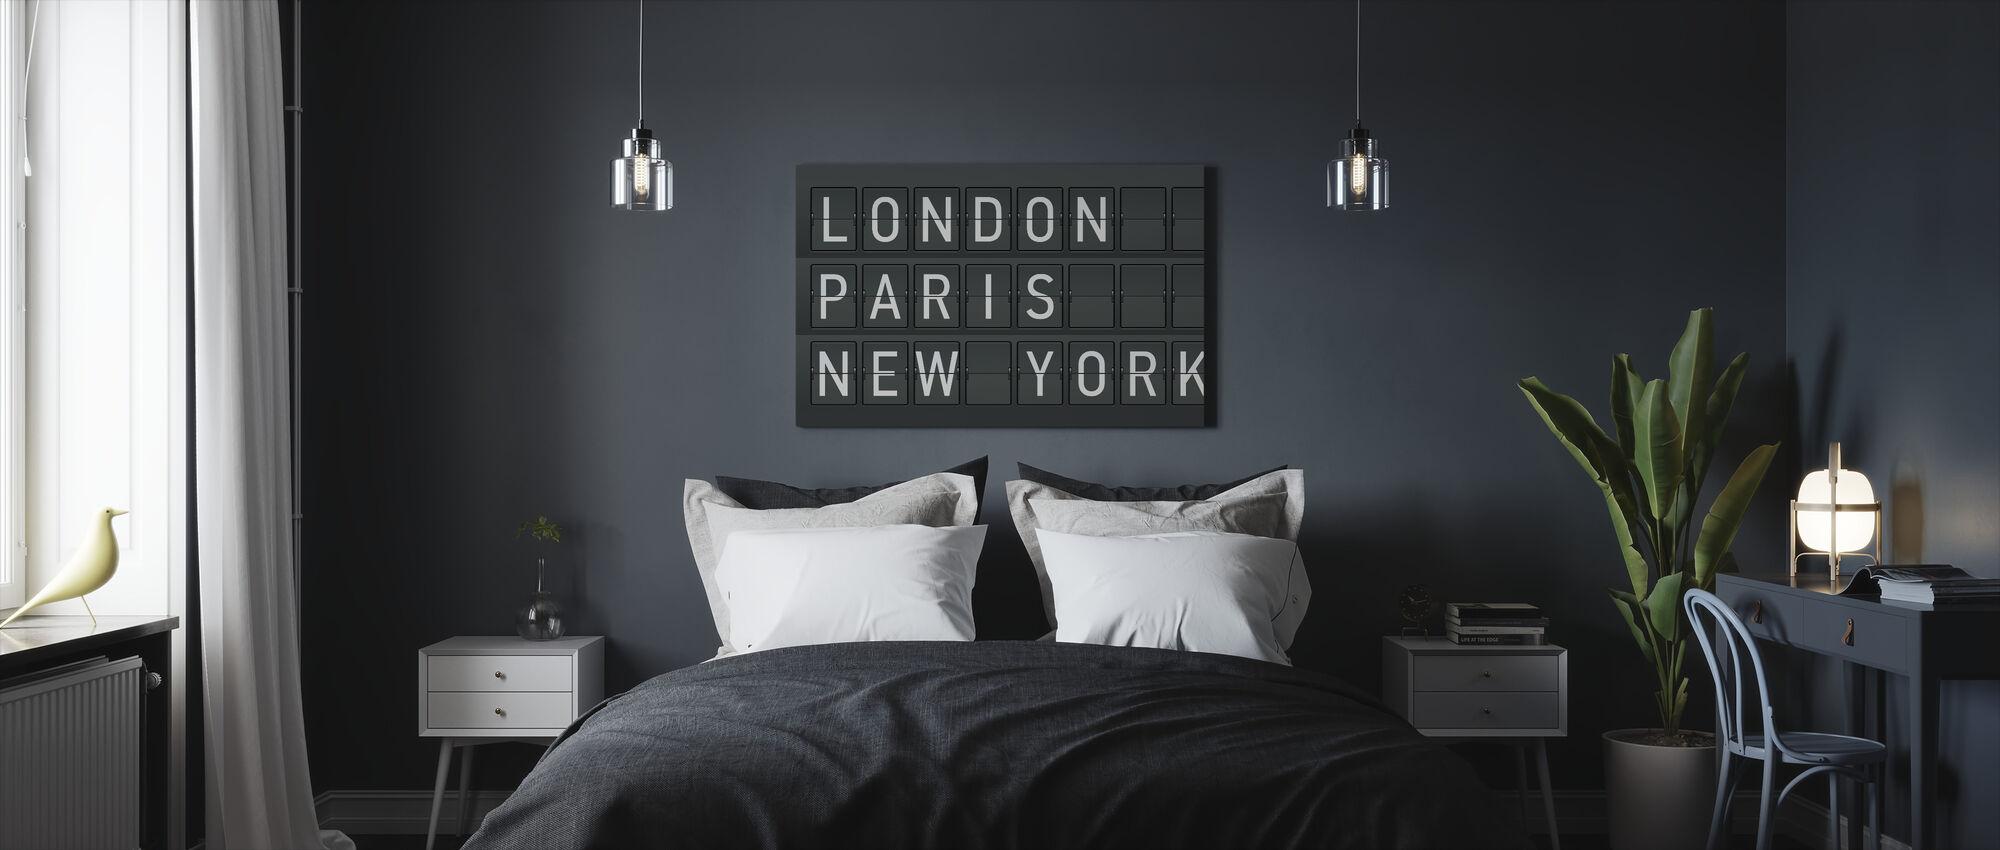 Lontoo - Pariisi - New York - Canvastaulu - Makuuhuone